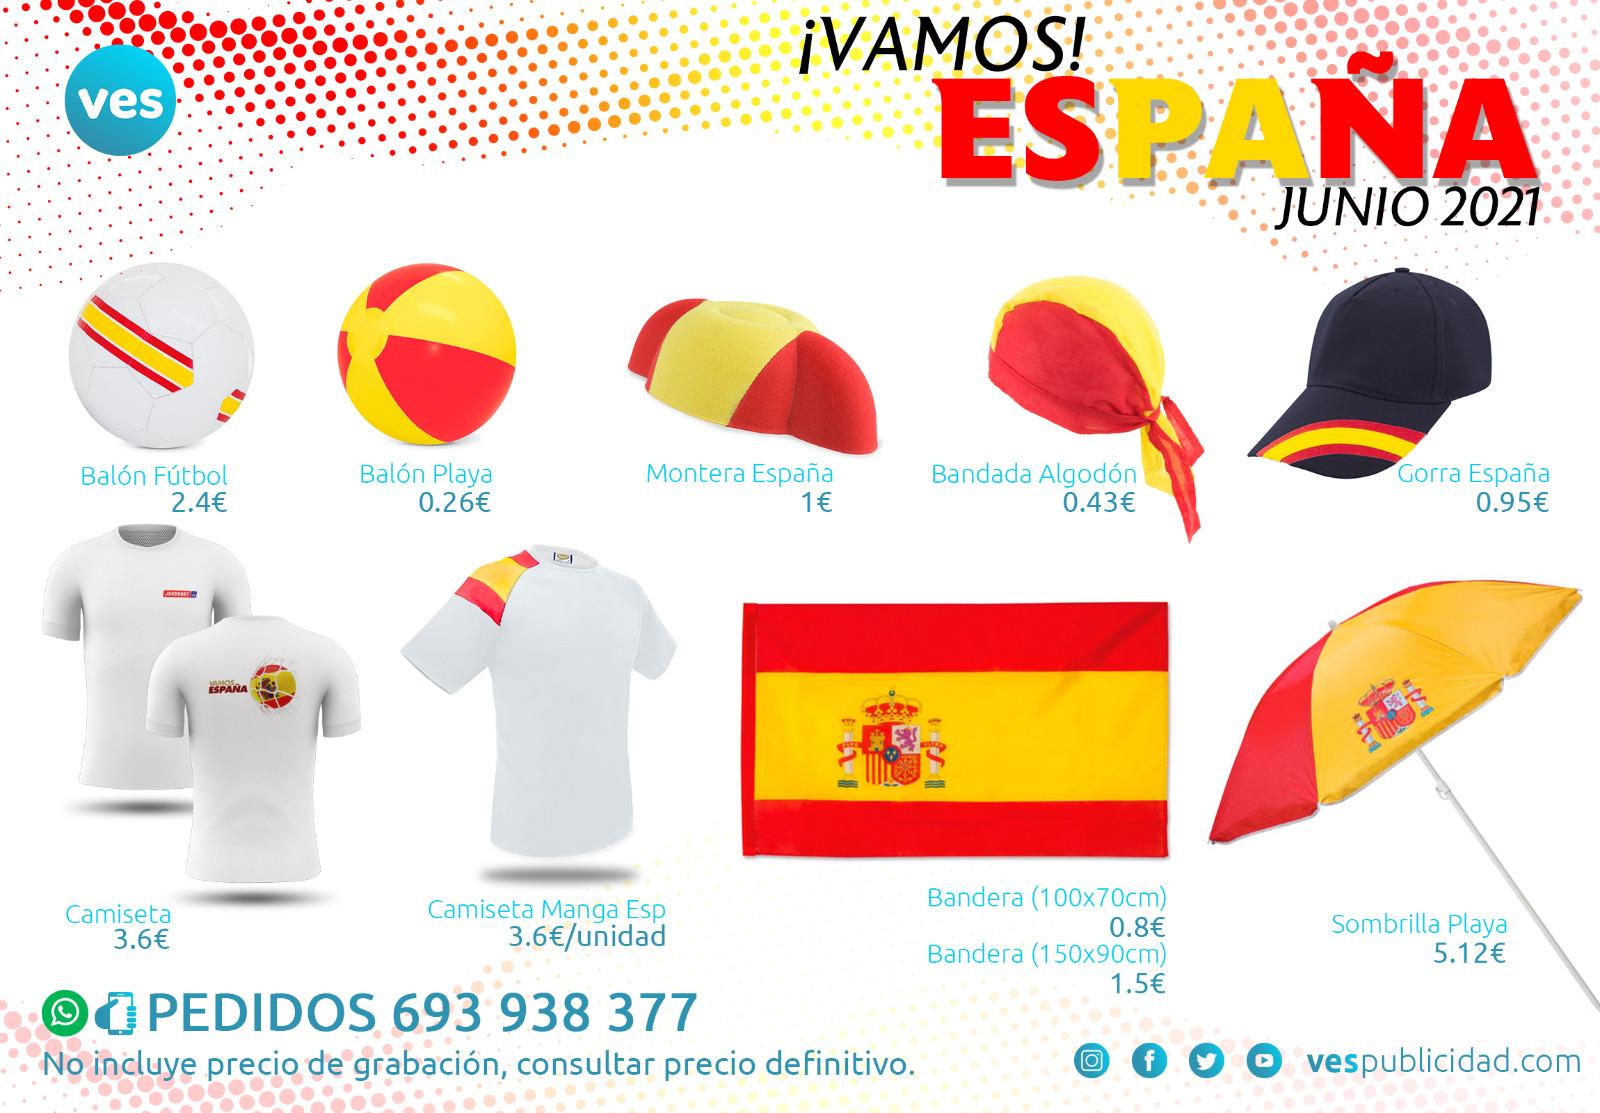 Eurocopa 2021 - Vamos España - Regalos